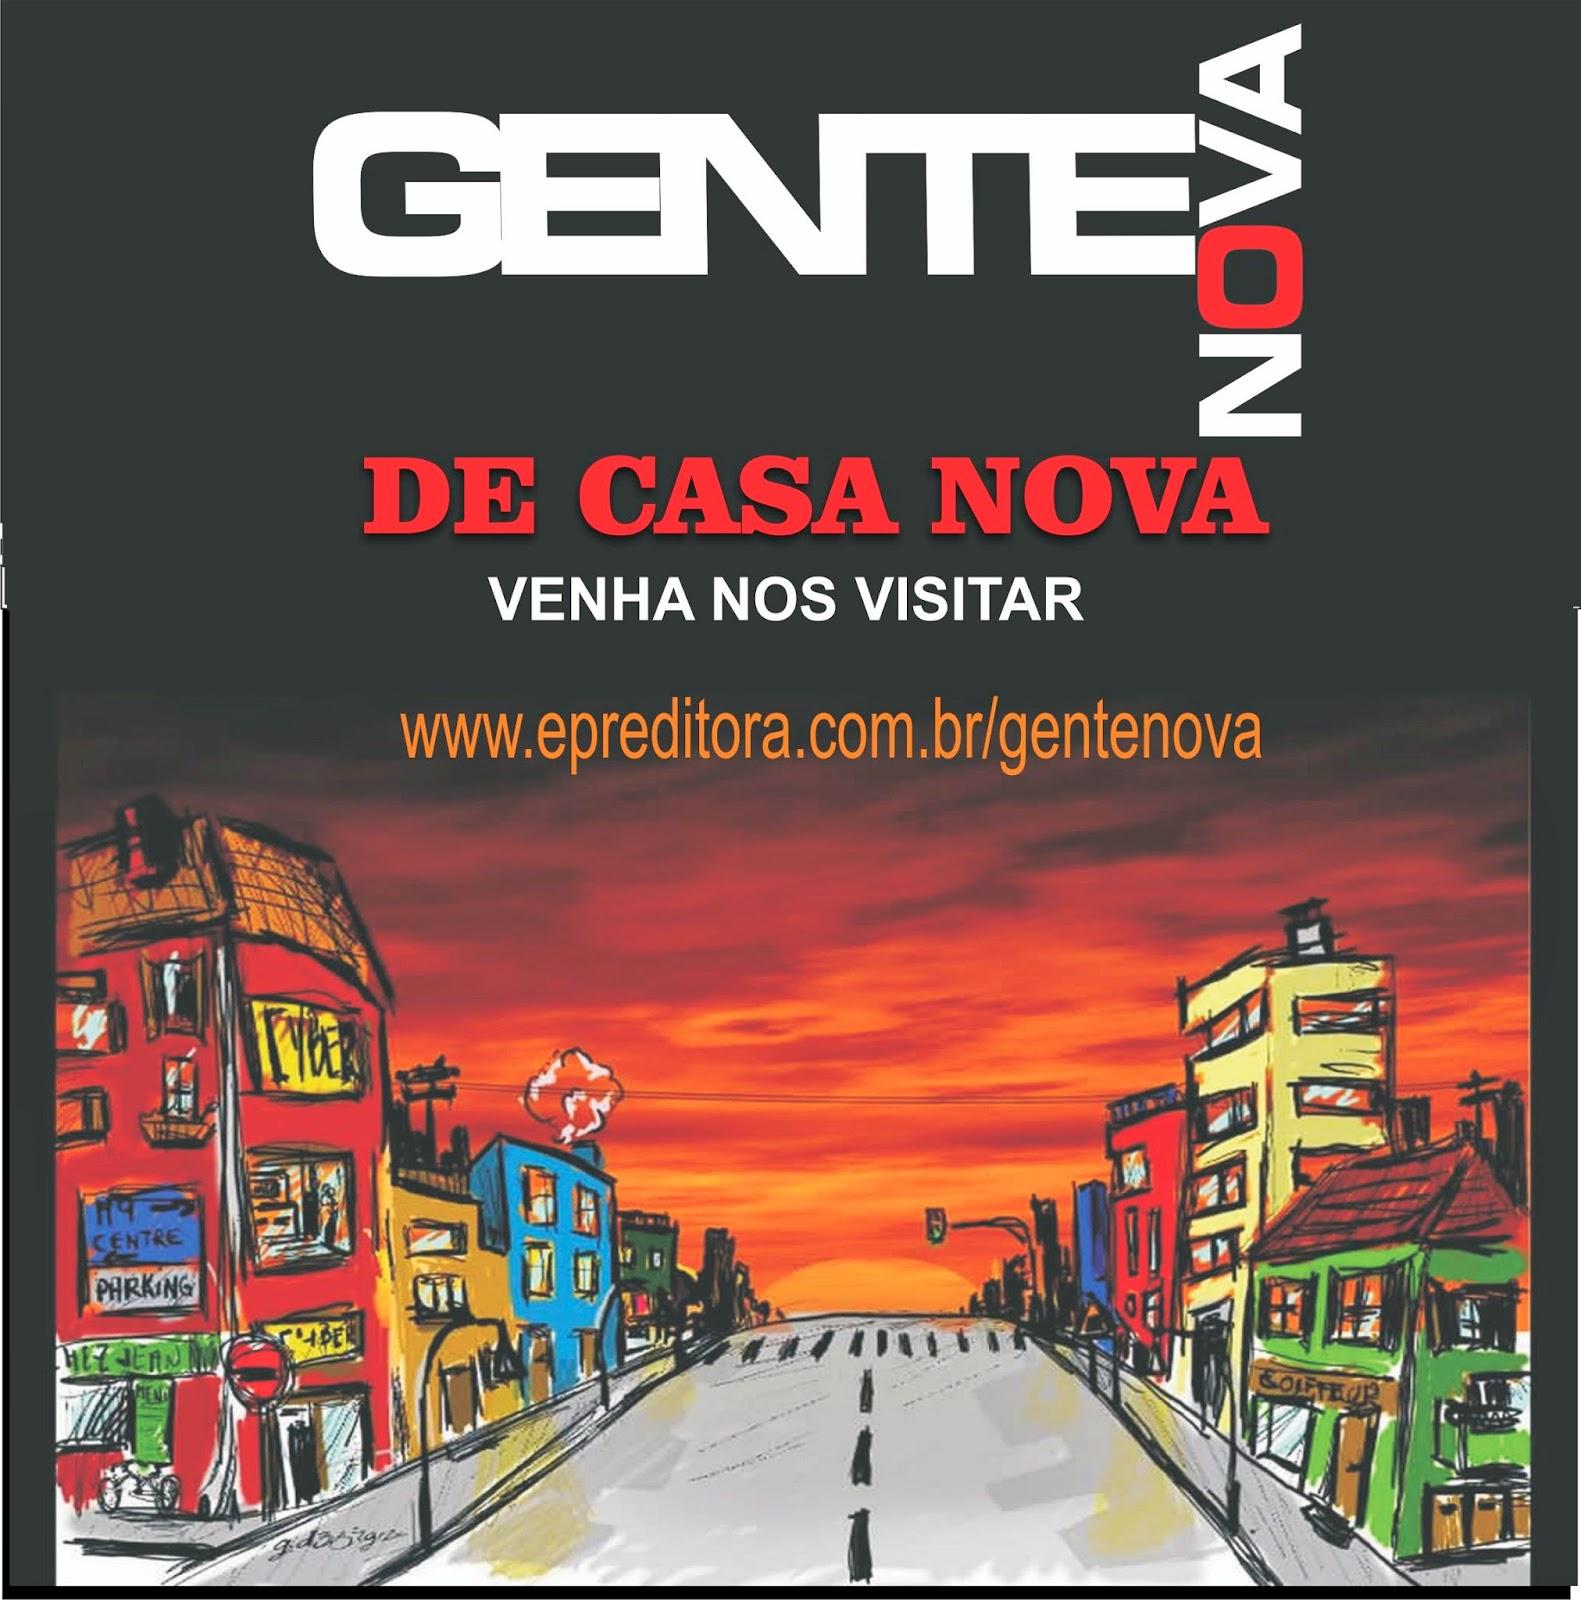 http://www.epreditora.com.br/gentenova